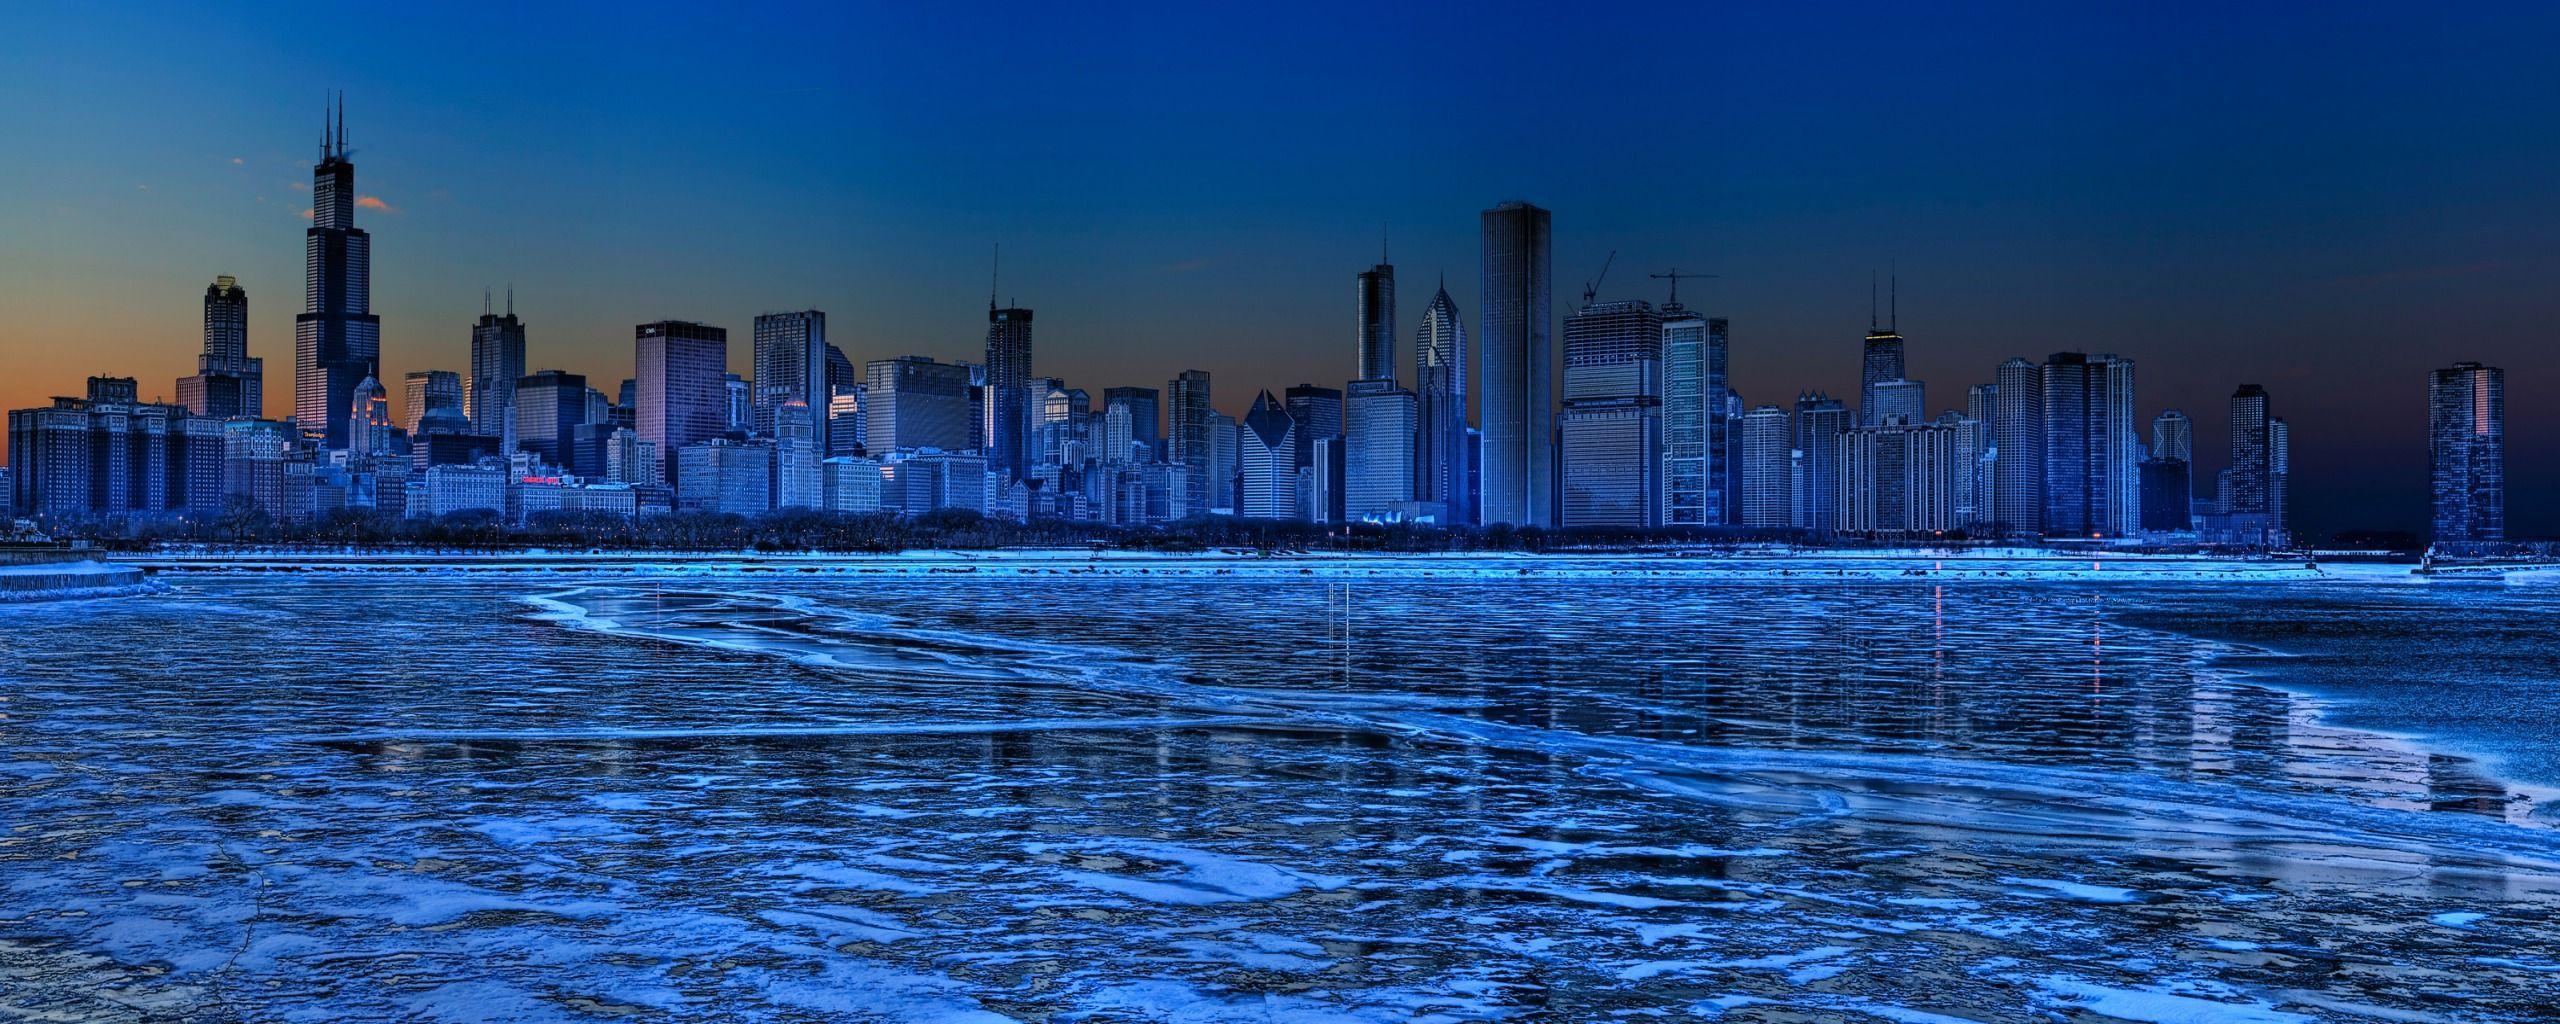 Extended Desktop Wallpaper City Landscape Blue City Dual Monitor Wallpaper